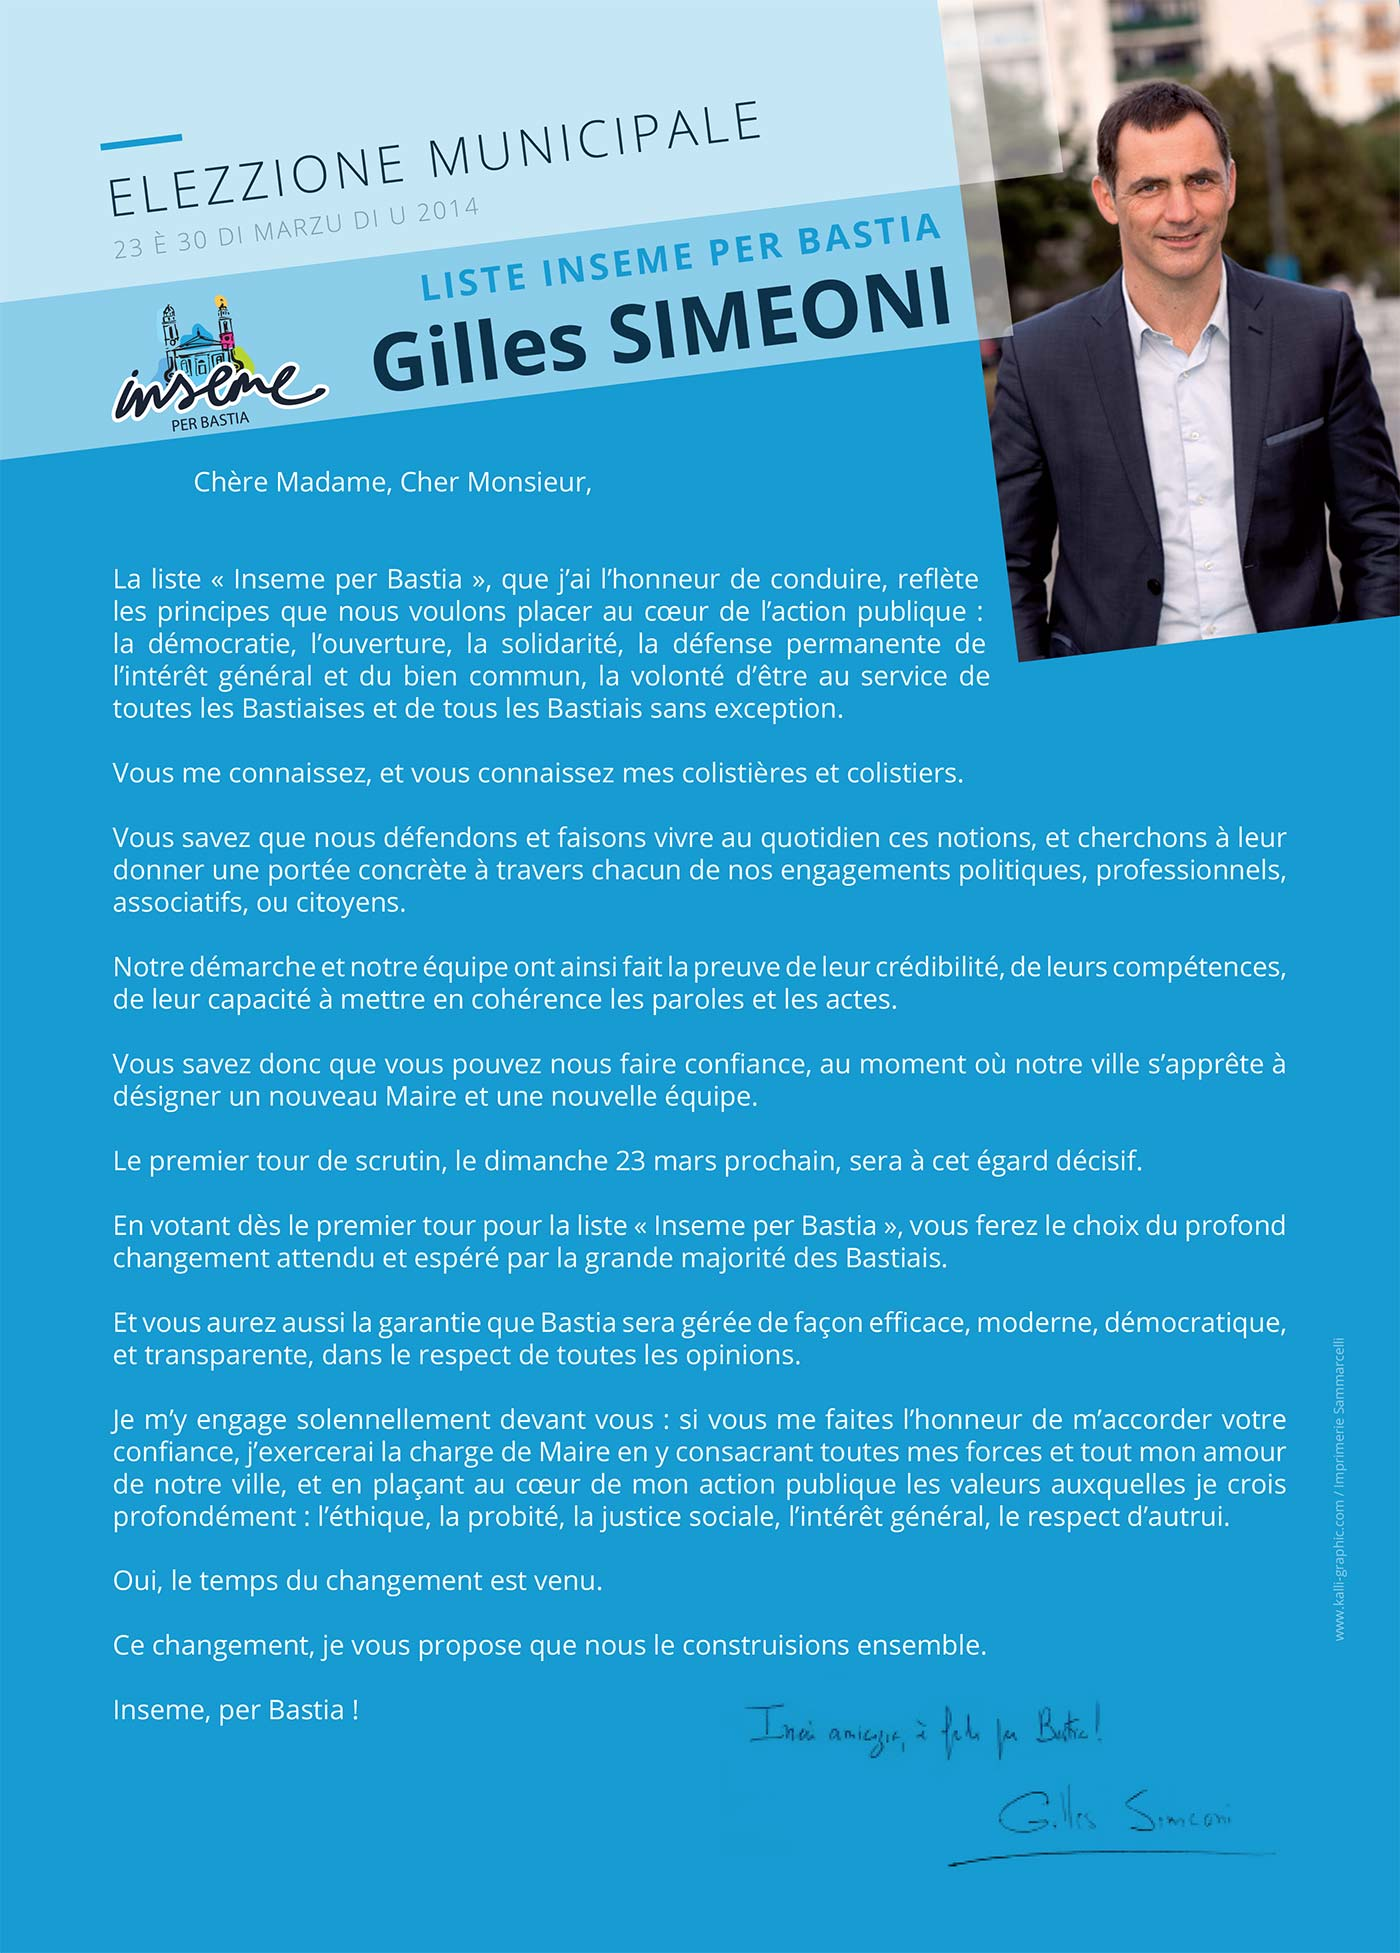 Profession_de_foi_Gilles_Simeoni-2014